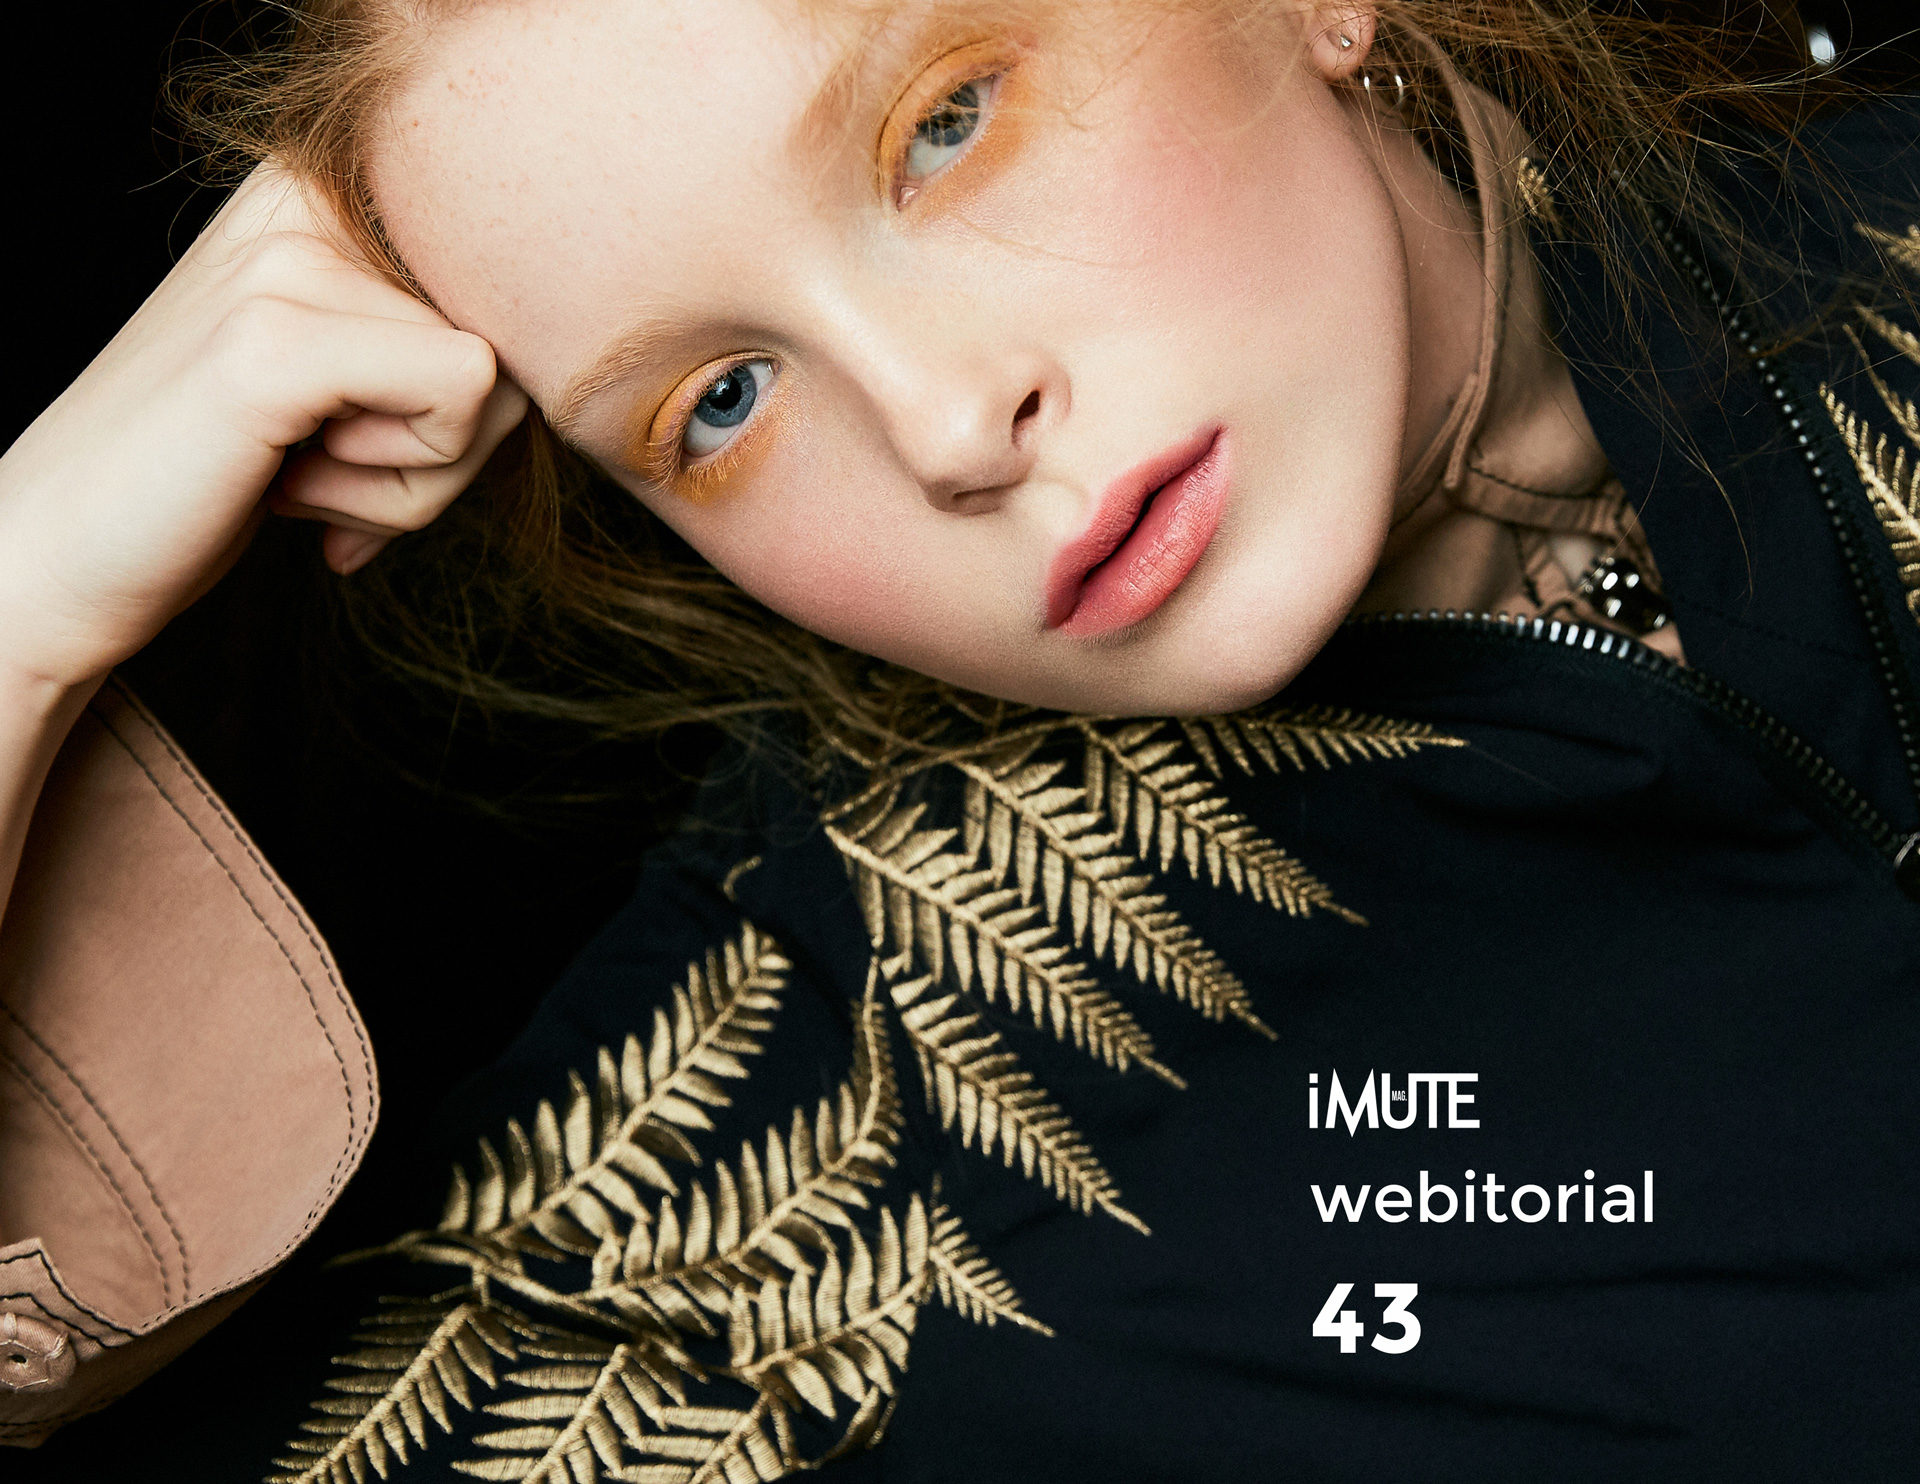 Color on color webitorial for iMute Magazine Photographer|Óli Magg Model| Urður Vala @Eskimo Models Stylist|Sigrun Jorgensen Makeup & Hair|Ástrós Erla Special thanks|ODDSON Reykjavík